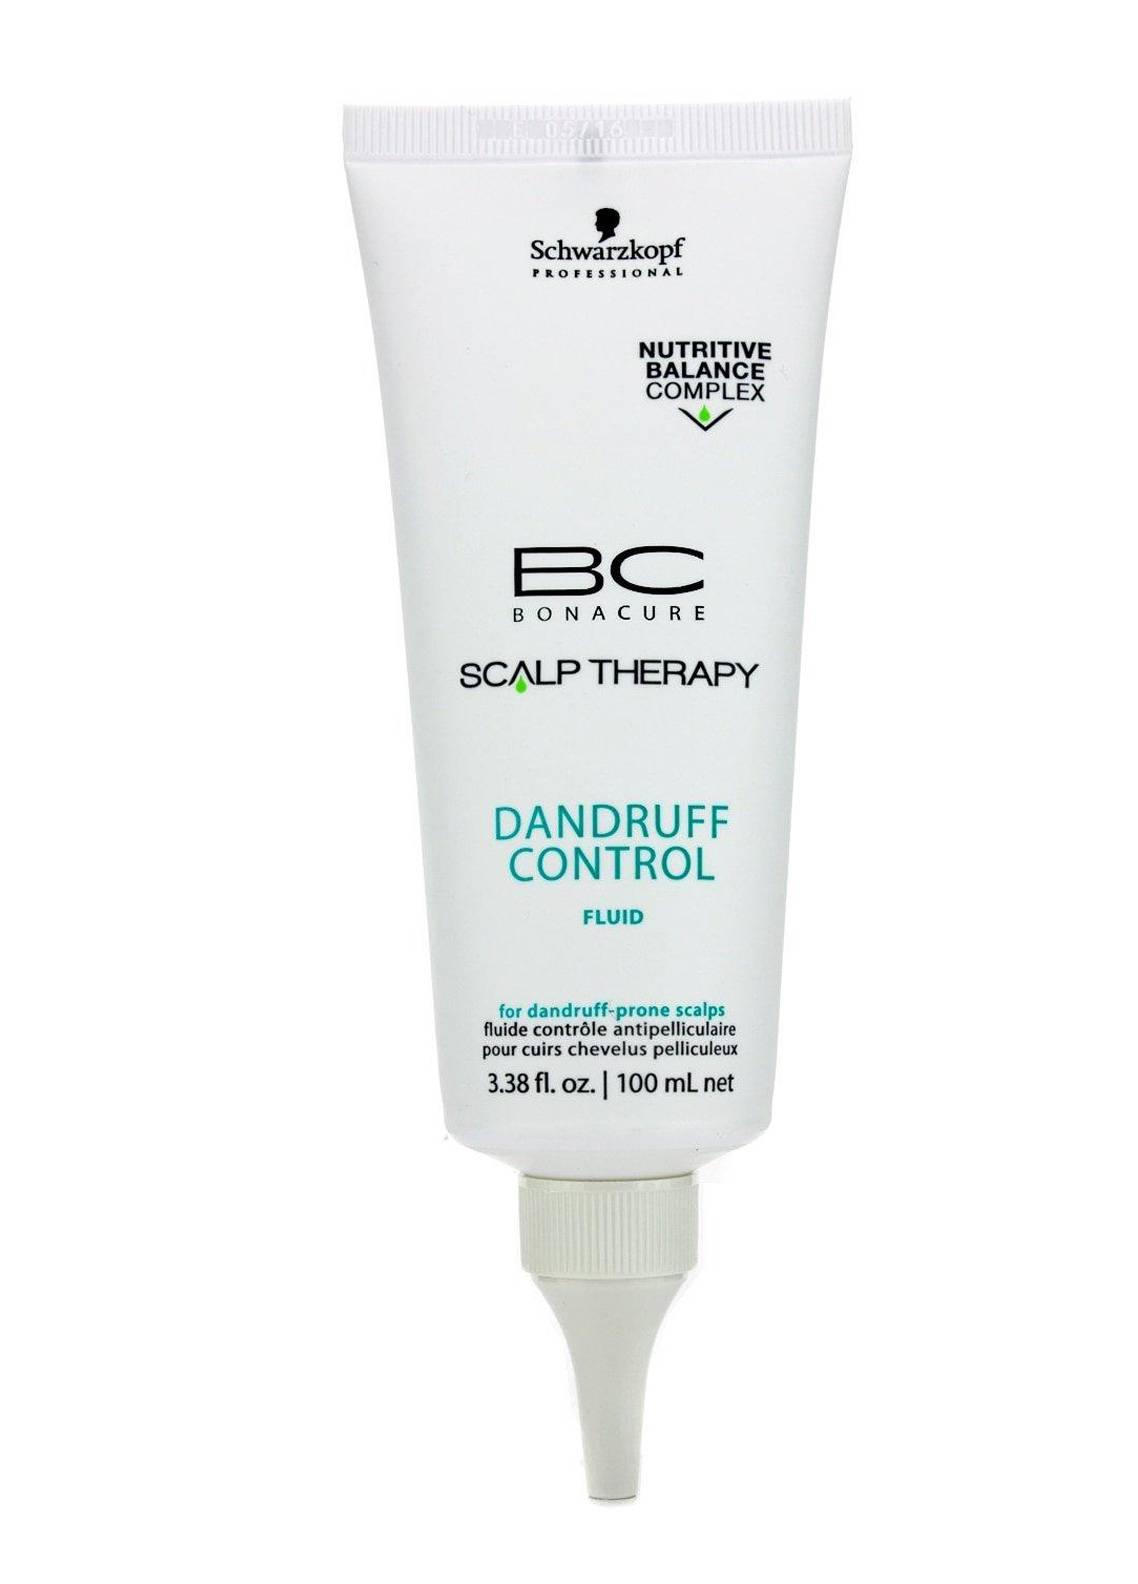 Schwarzkopf Dandruff Control Fluid - 100 ml